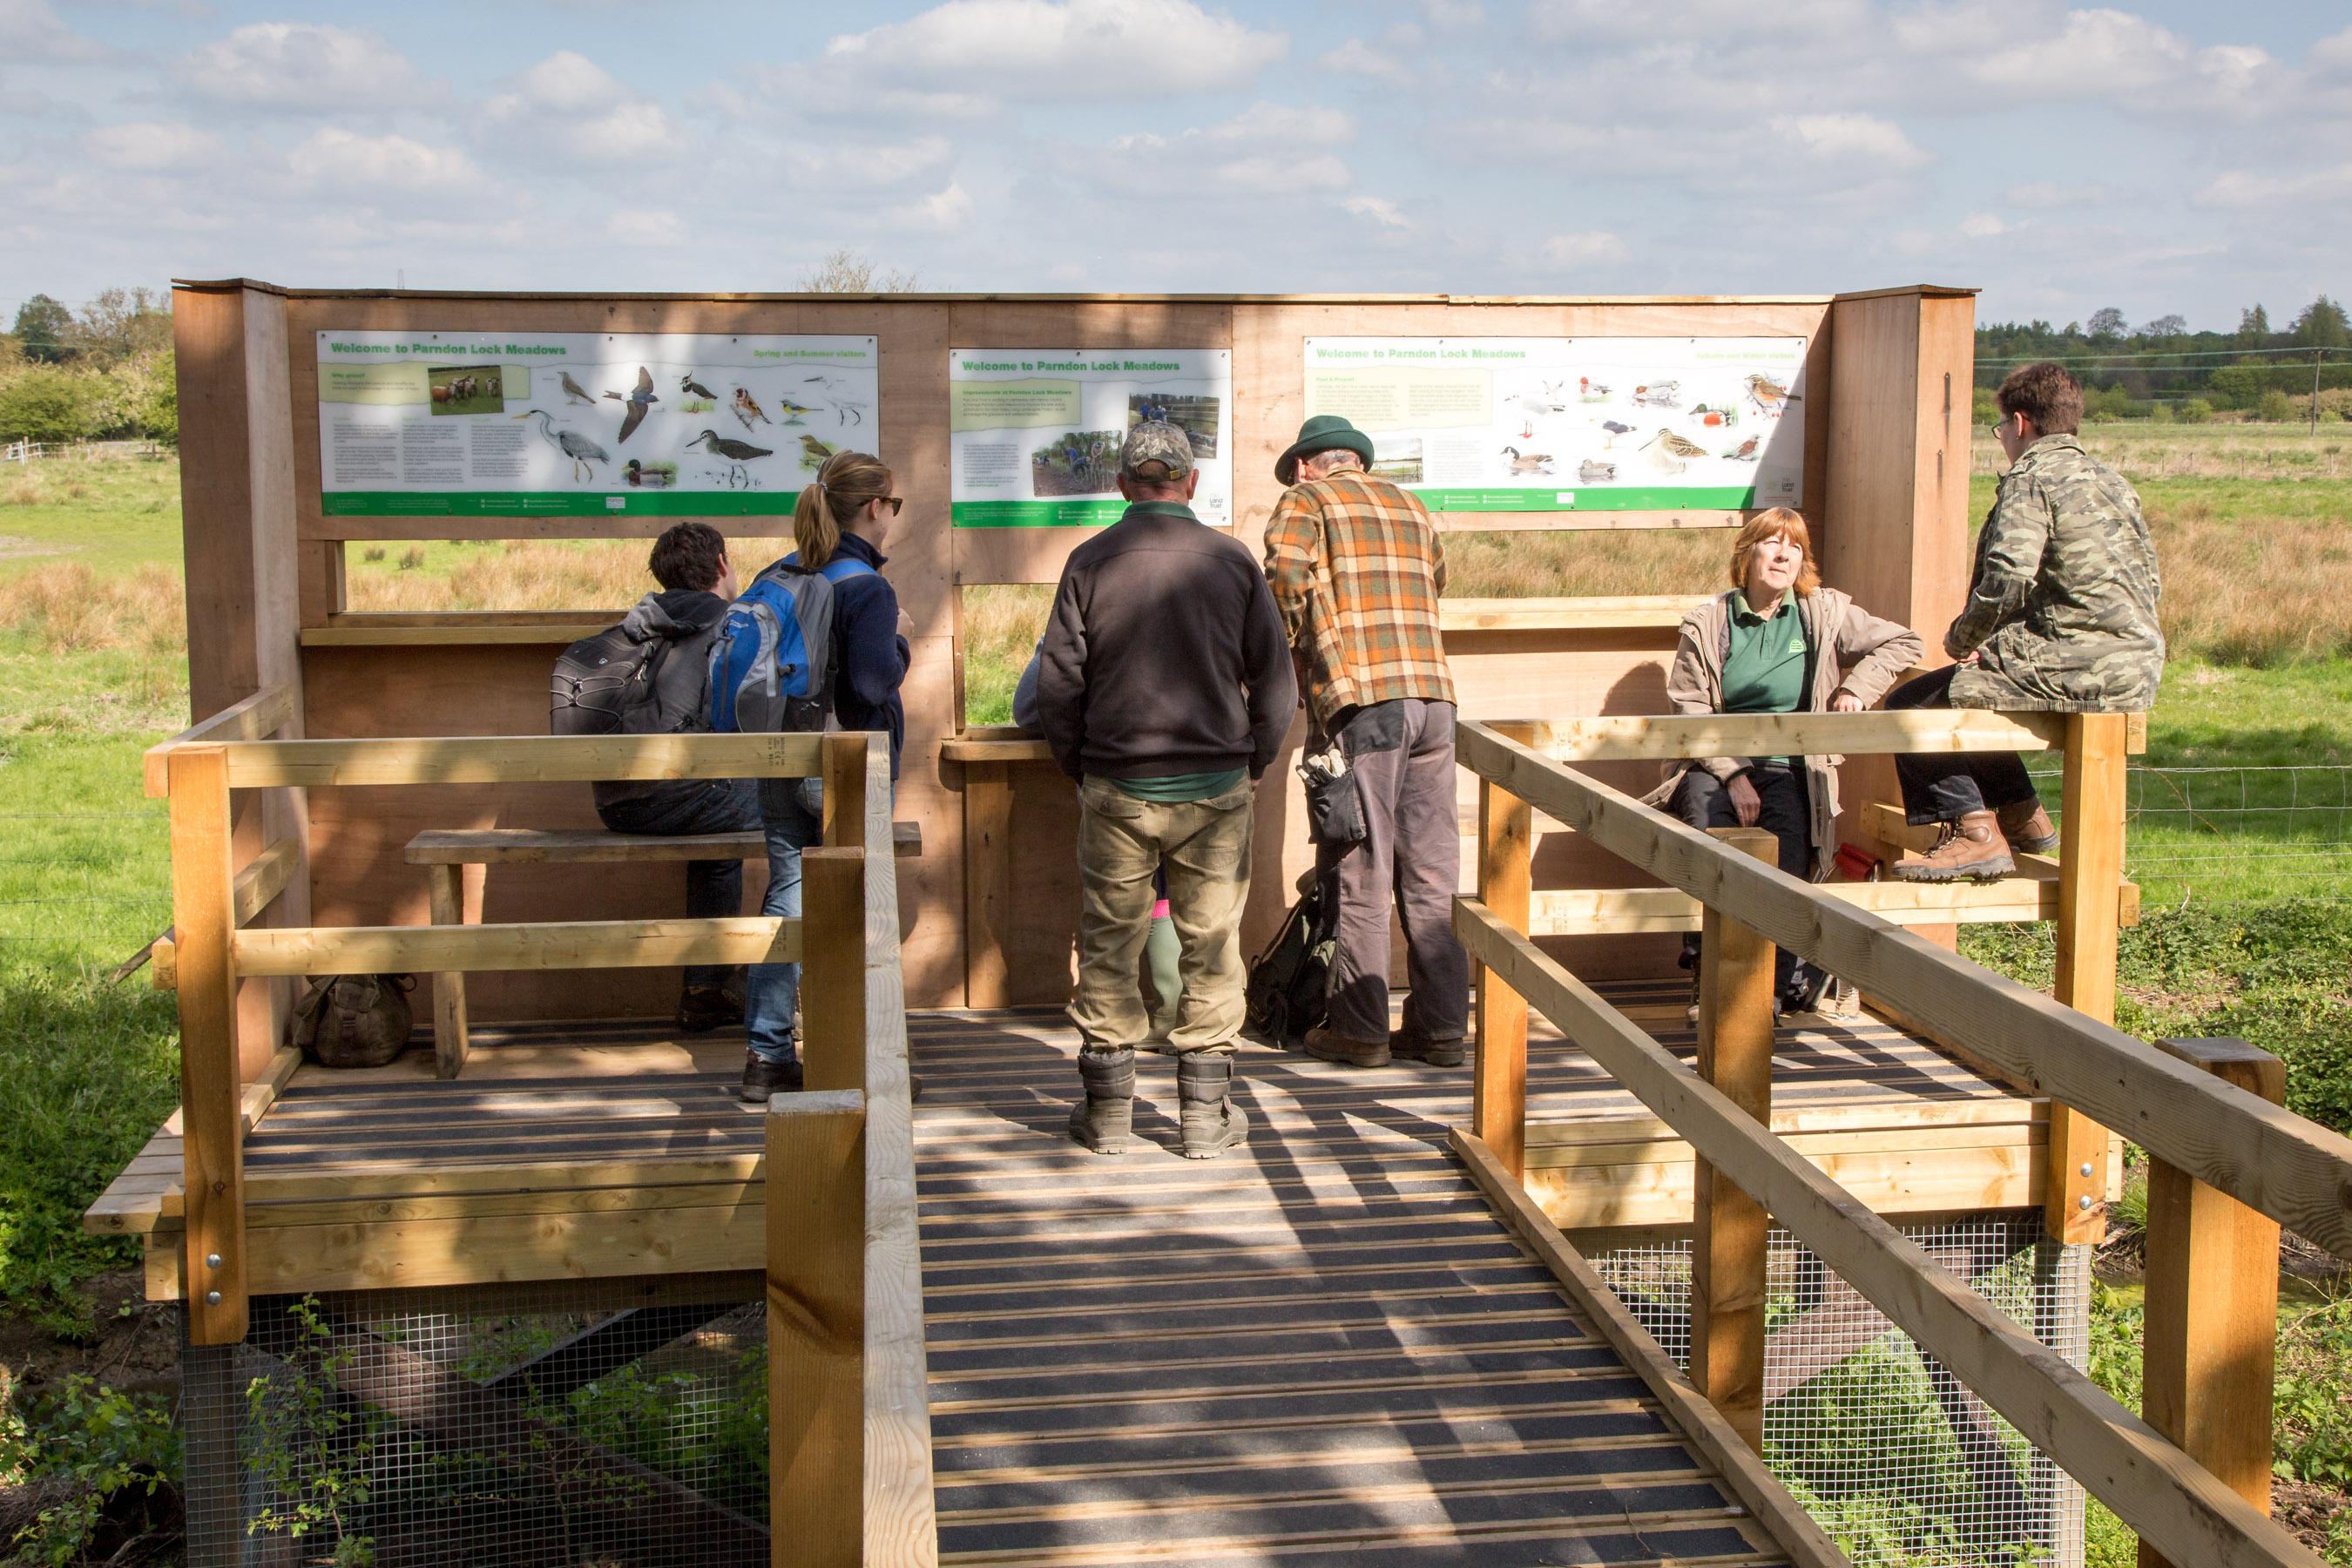 Viewing platform in use at Parndon Lock Meadows